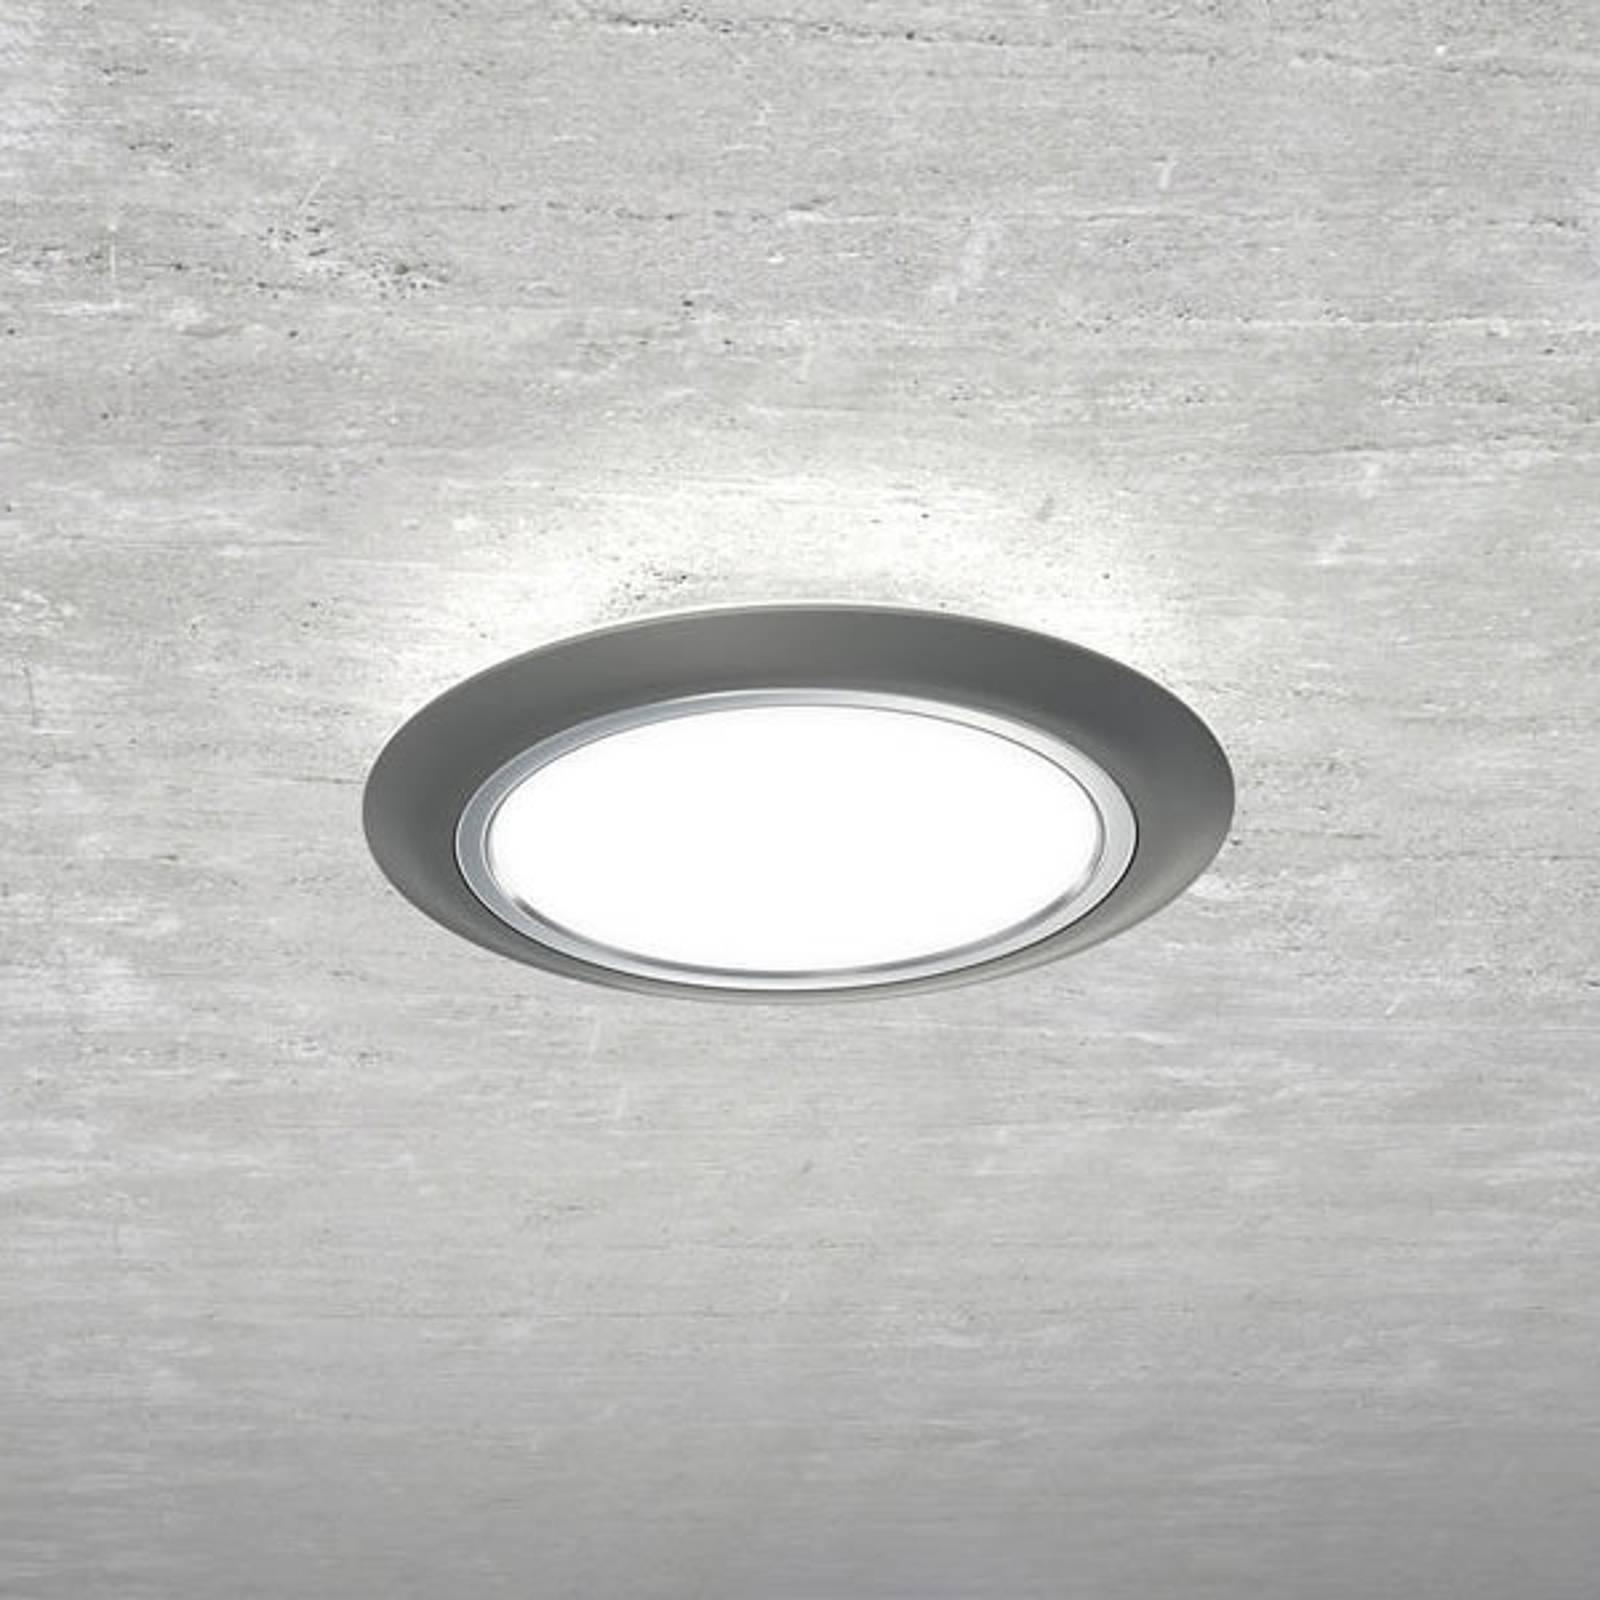 GU5,3 5W 840 lampadina LED a riflettore